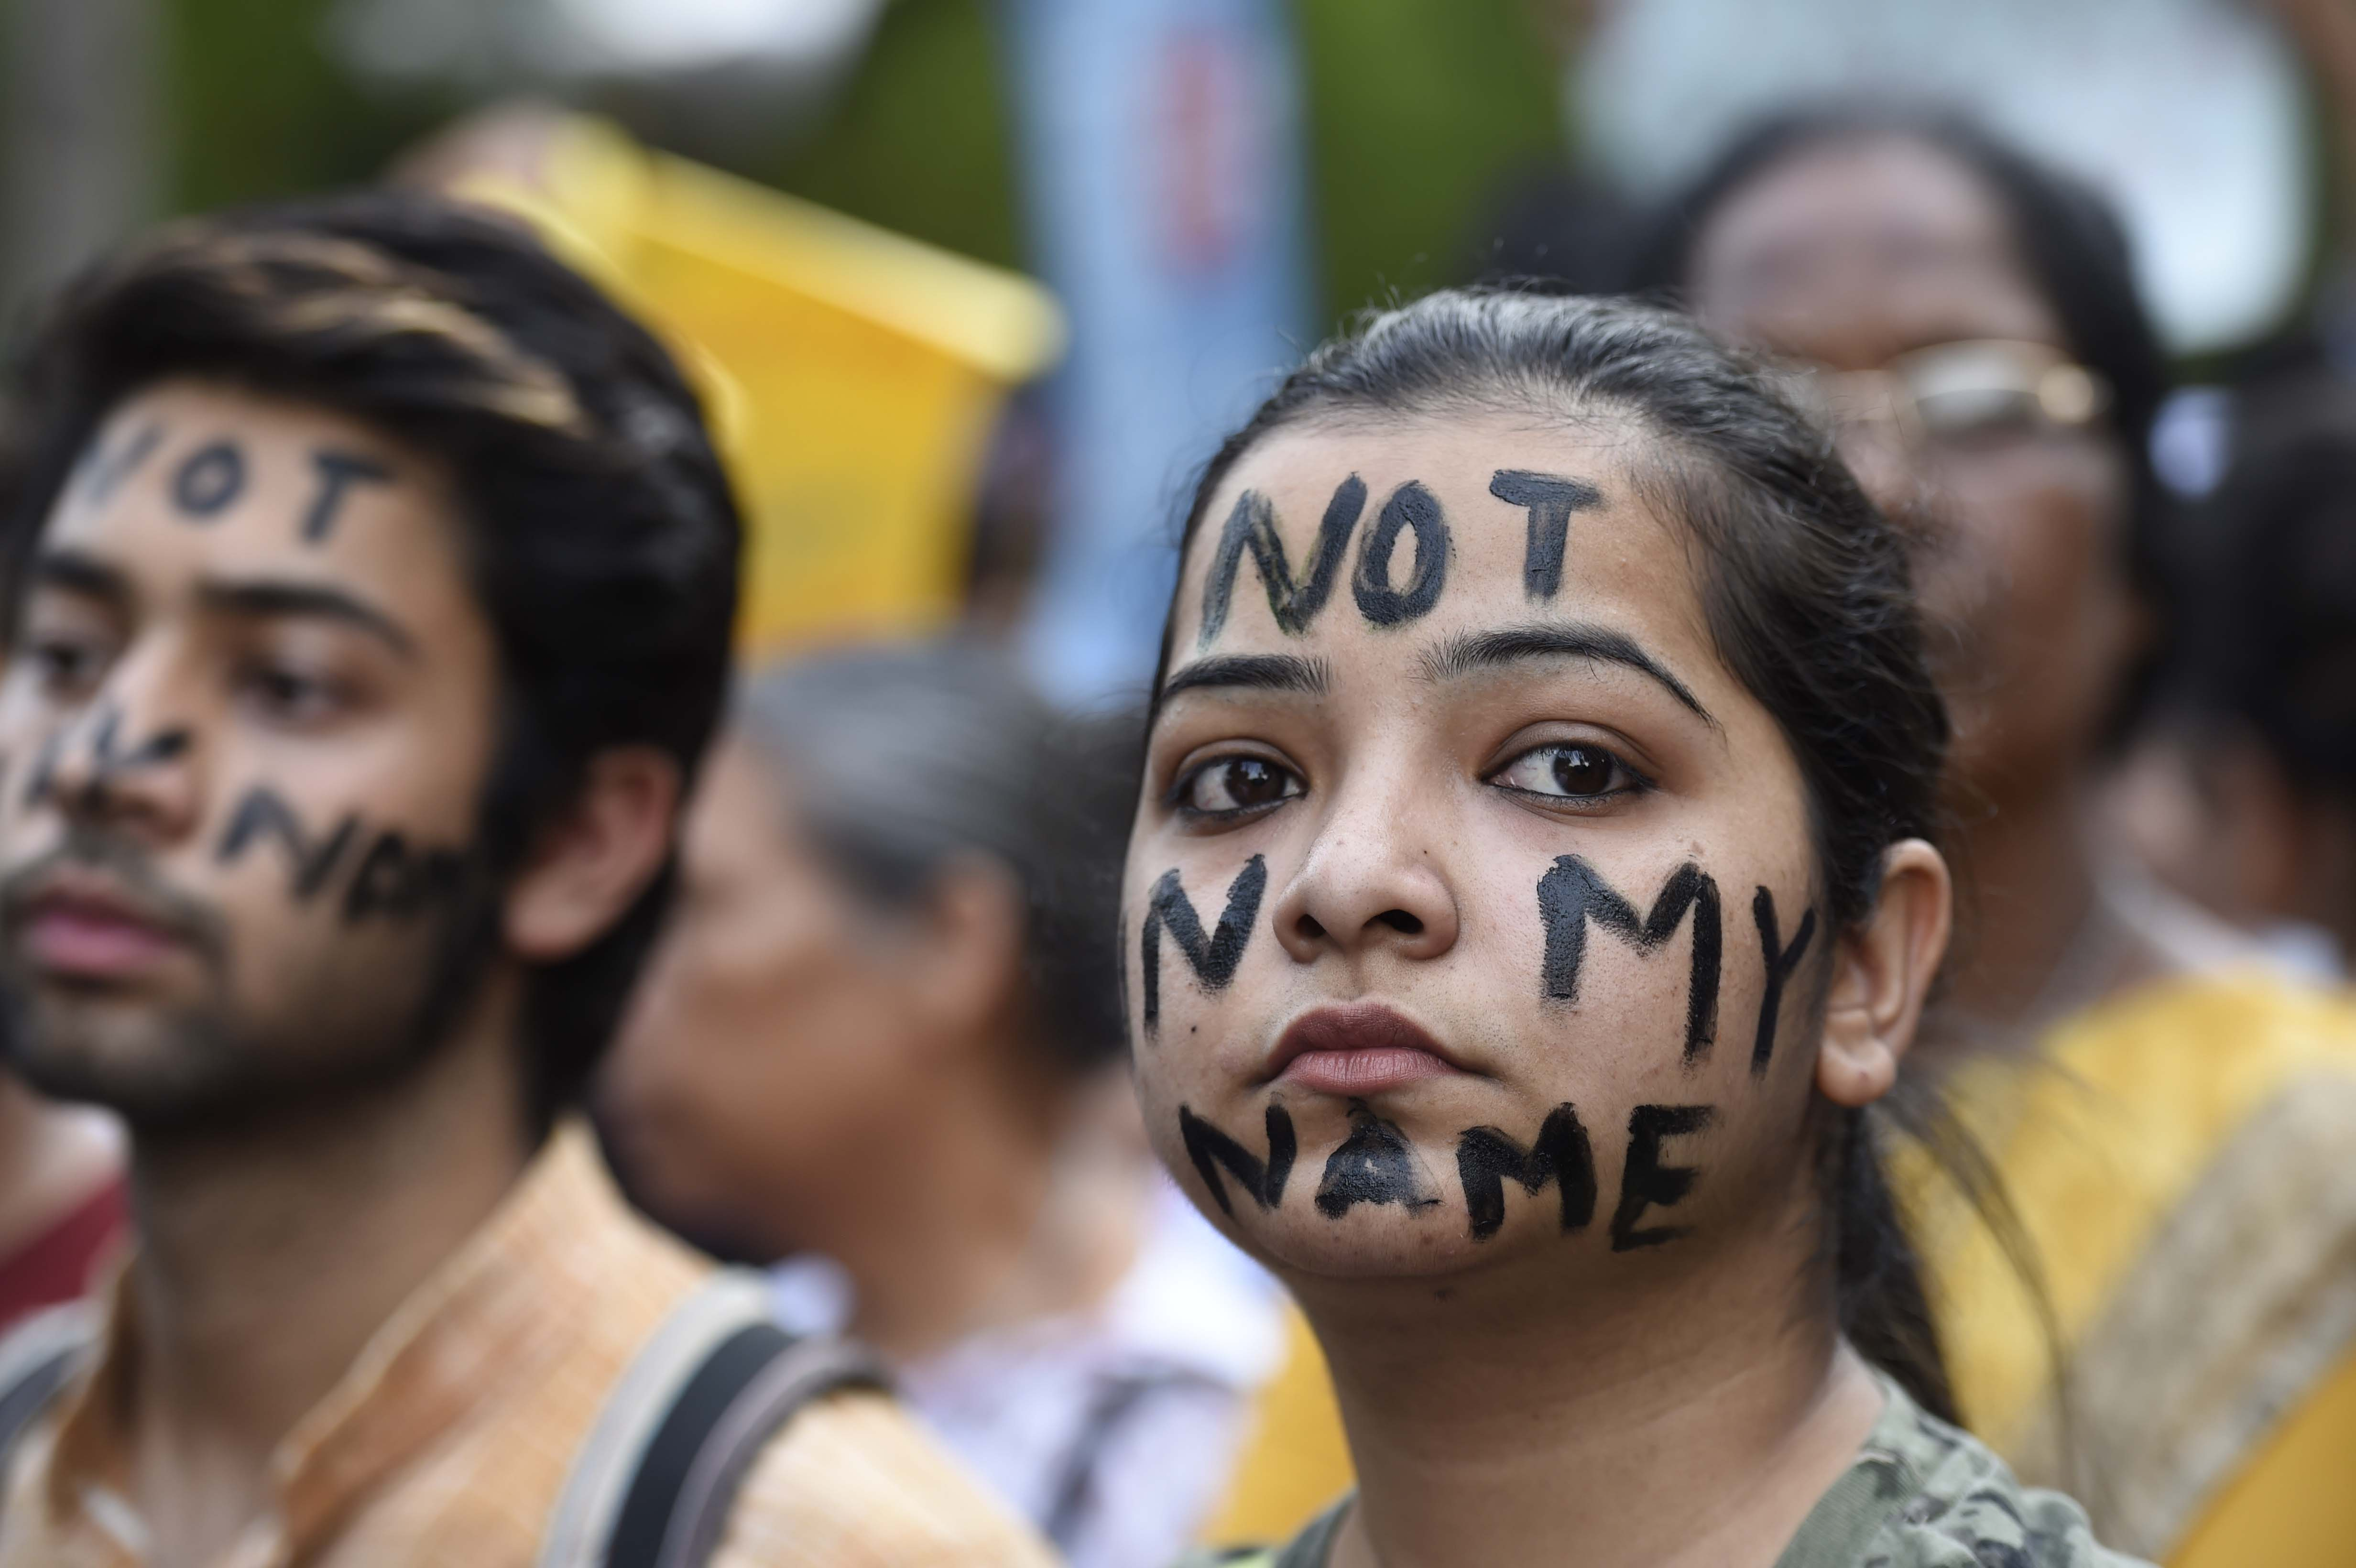 Third Indian allegedly raped, set on fire - CNN Video